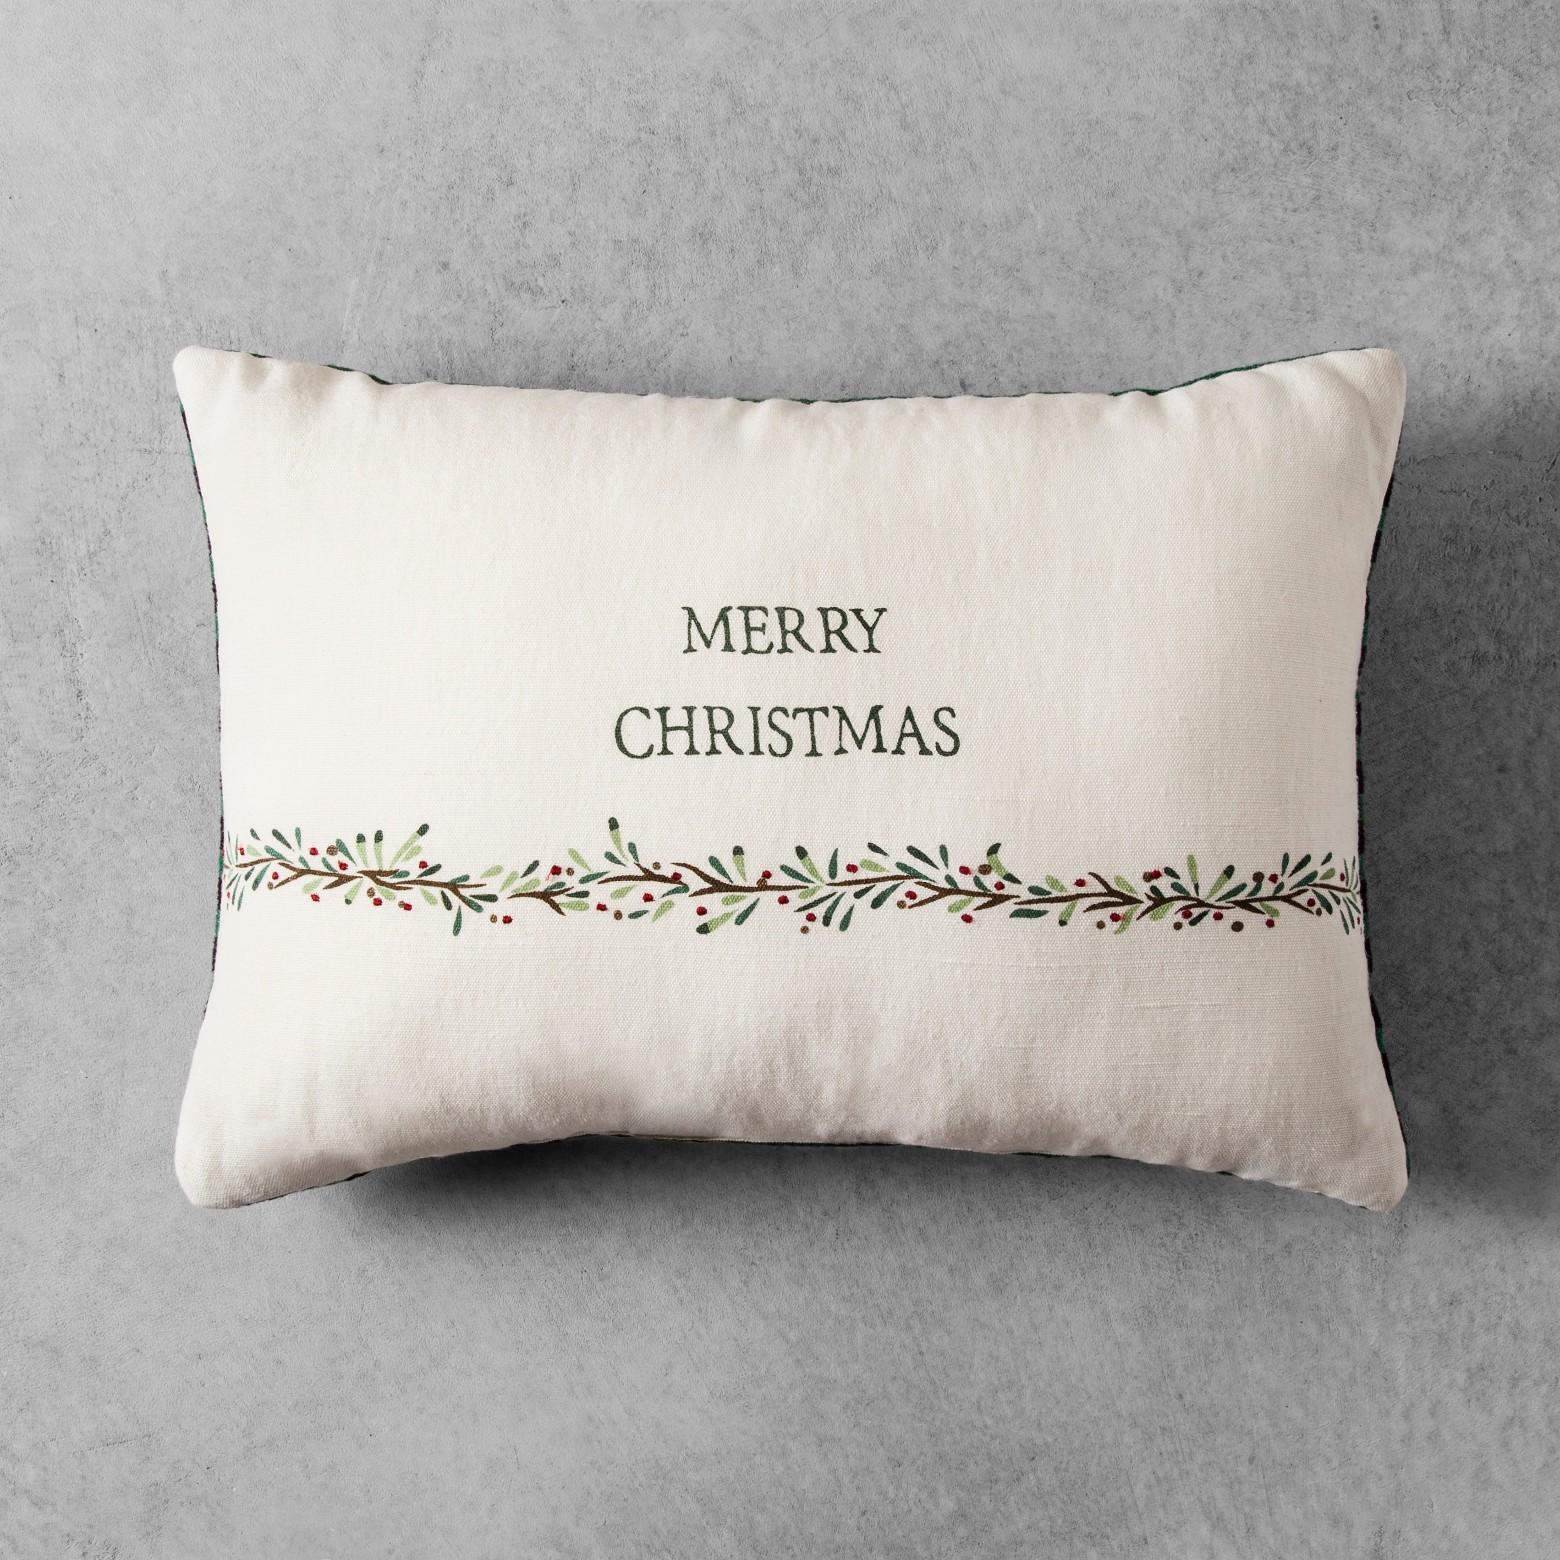 Home & Hearth Christmas Pillow